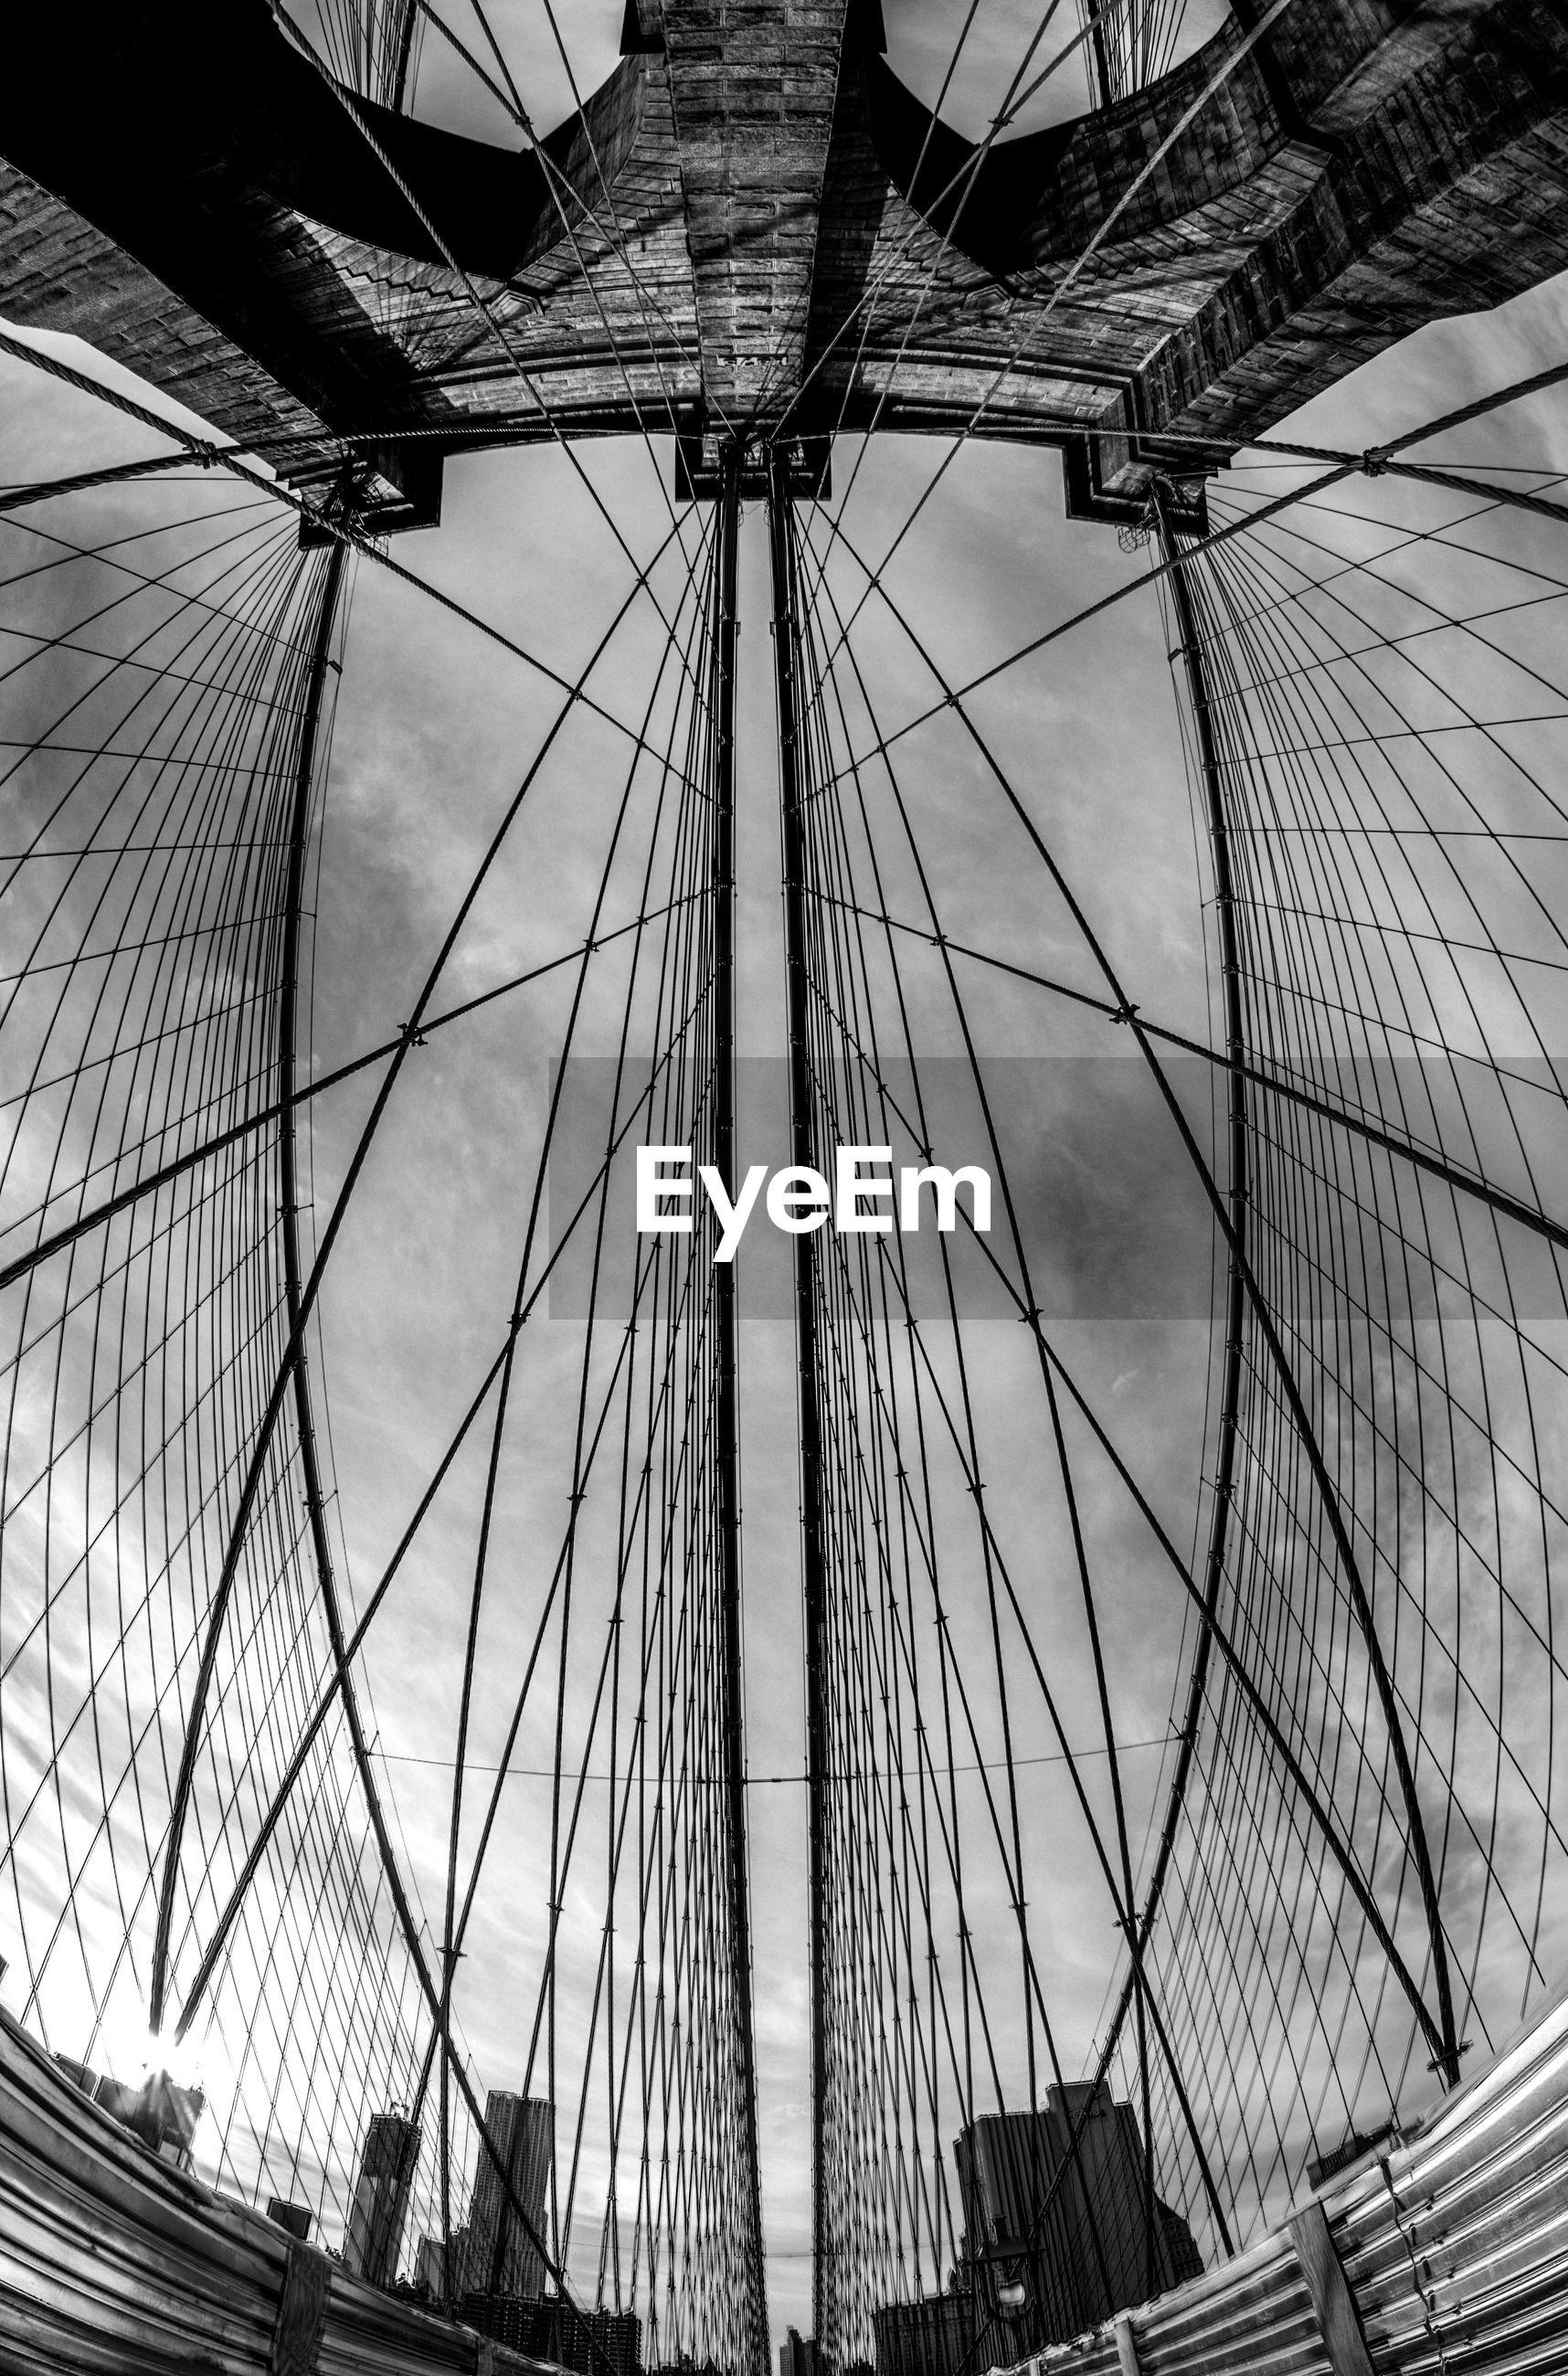 Fish-eye lens of brooklyn bridge against cloudy sky